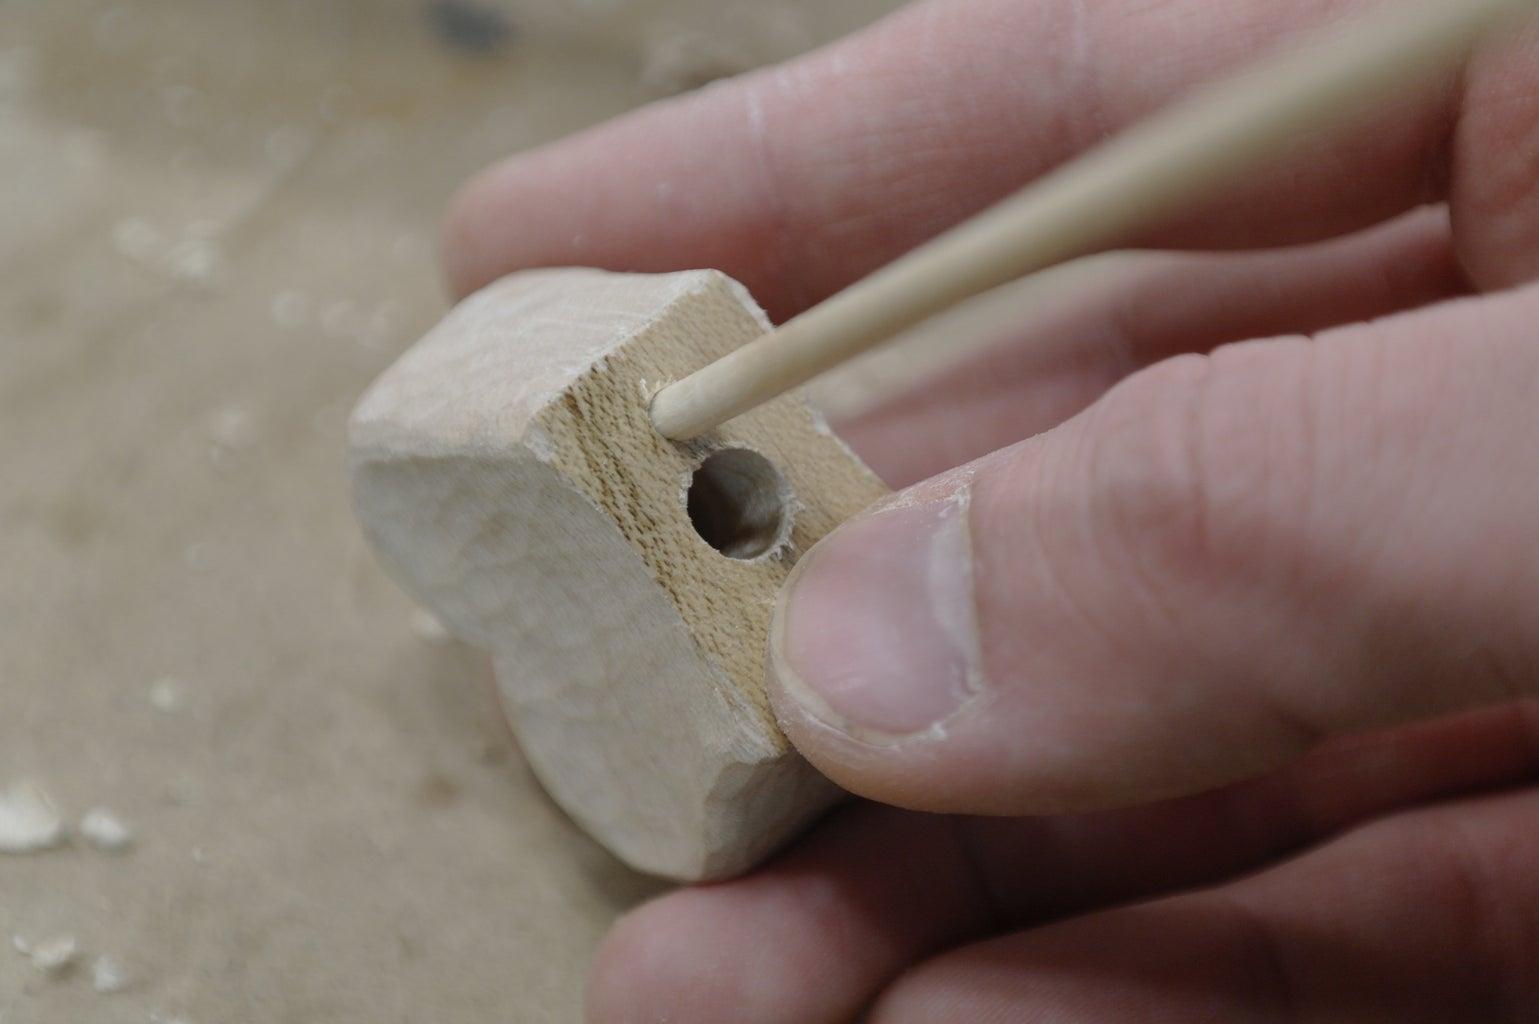 Shaping the Bone